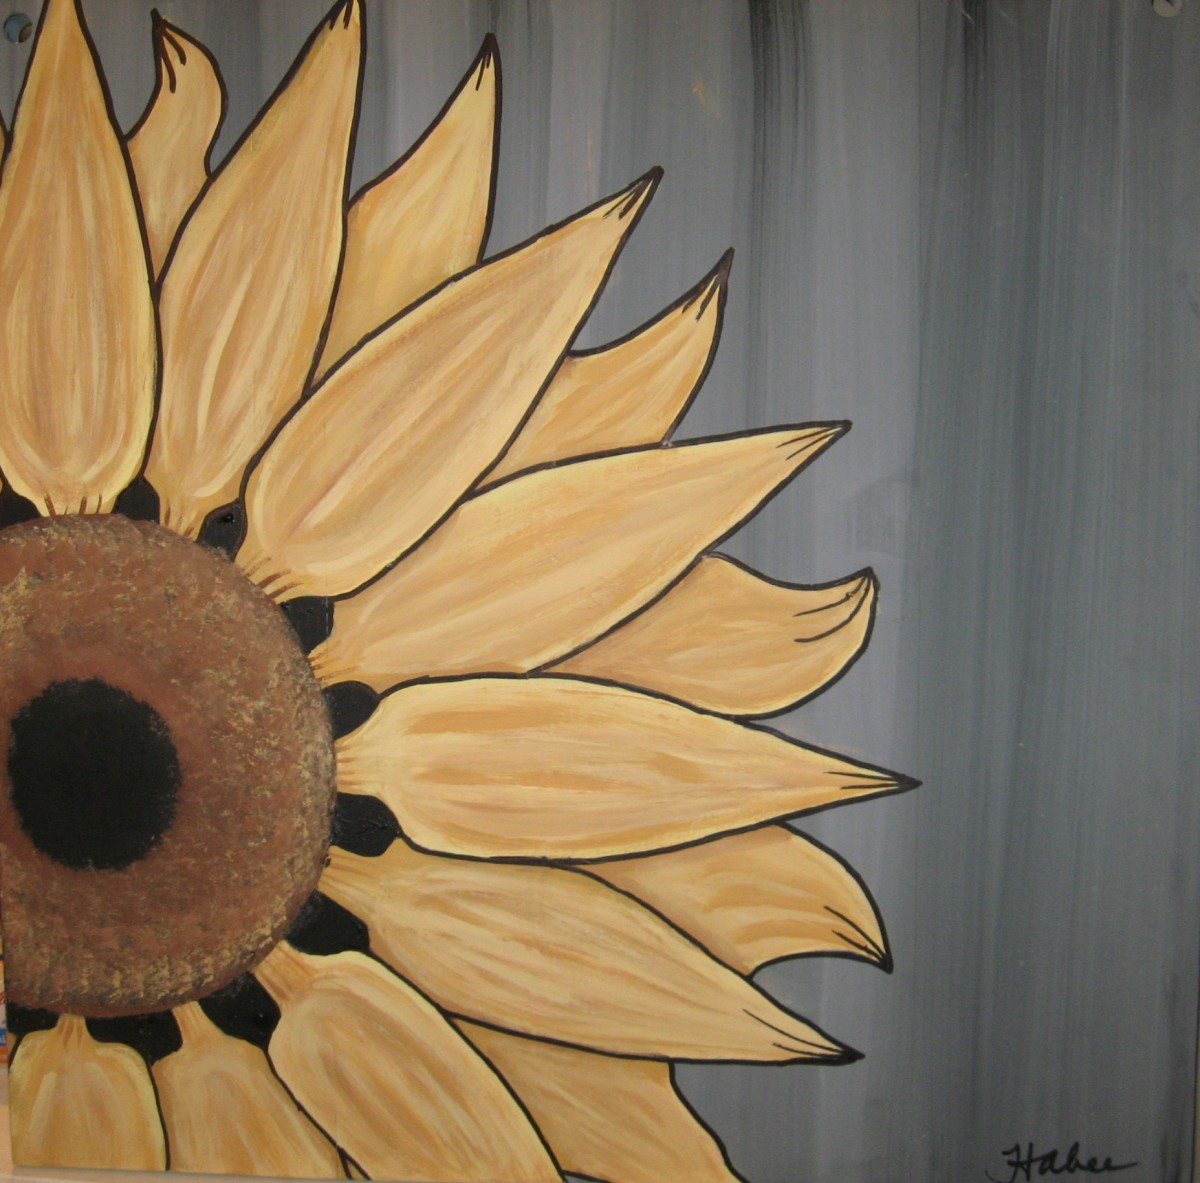 Sunflower on Planks